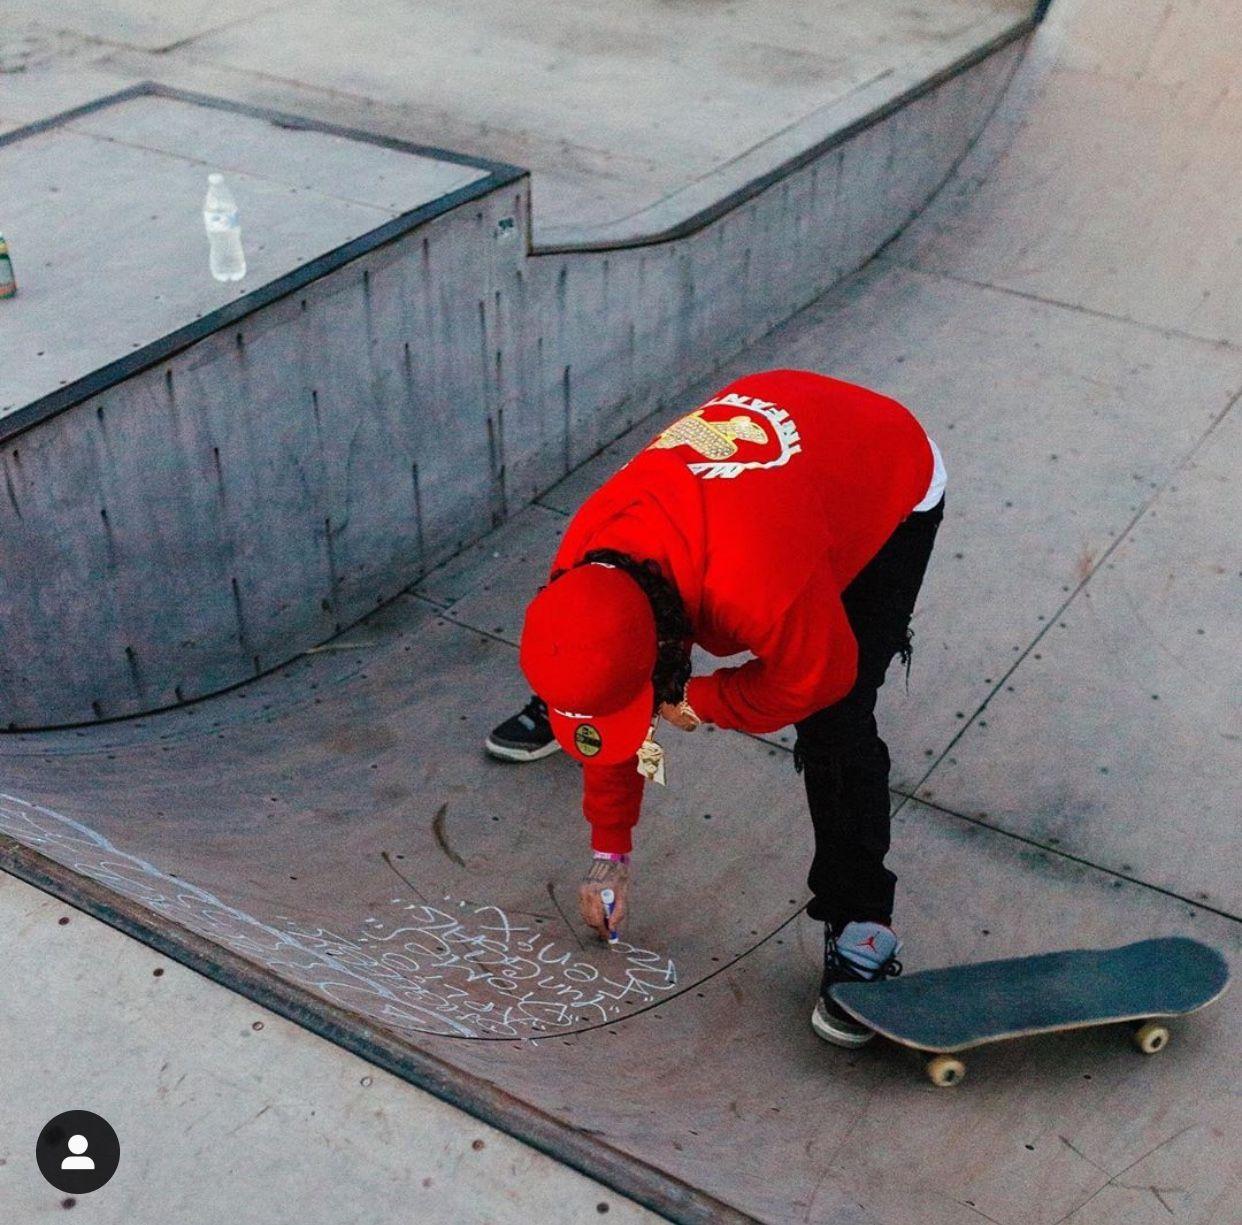 Pin By Kevtrev On Shoreline In 2020 Rap Wallpaper Shoreline Skateboard